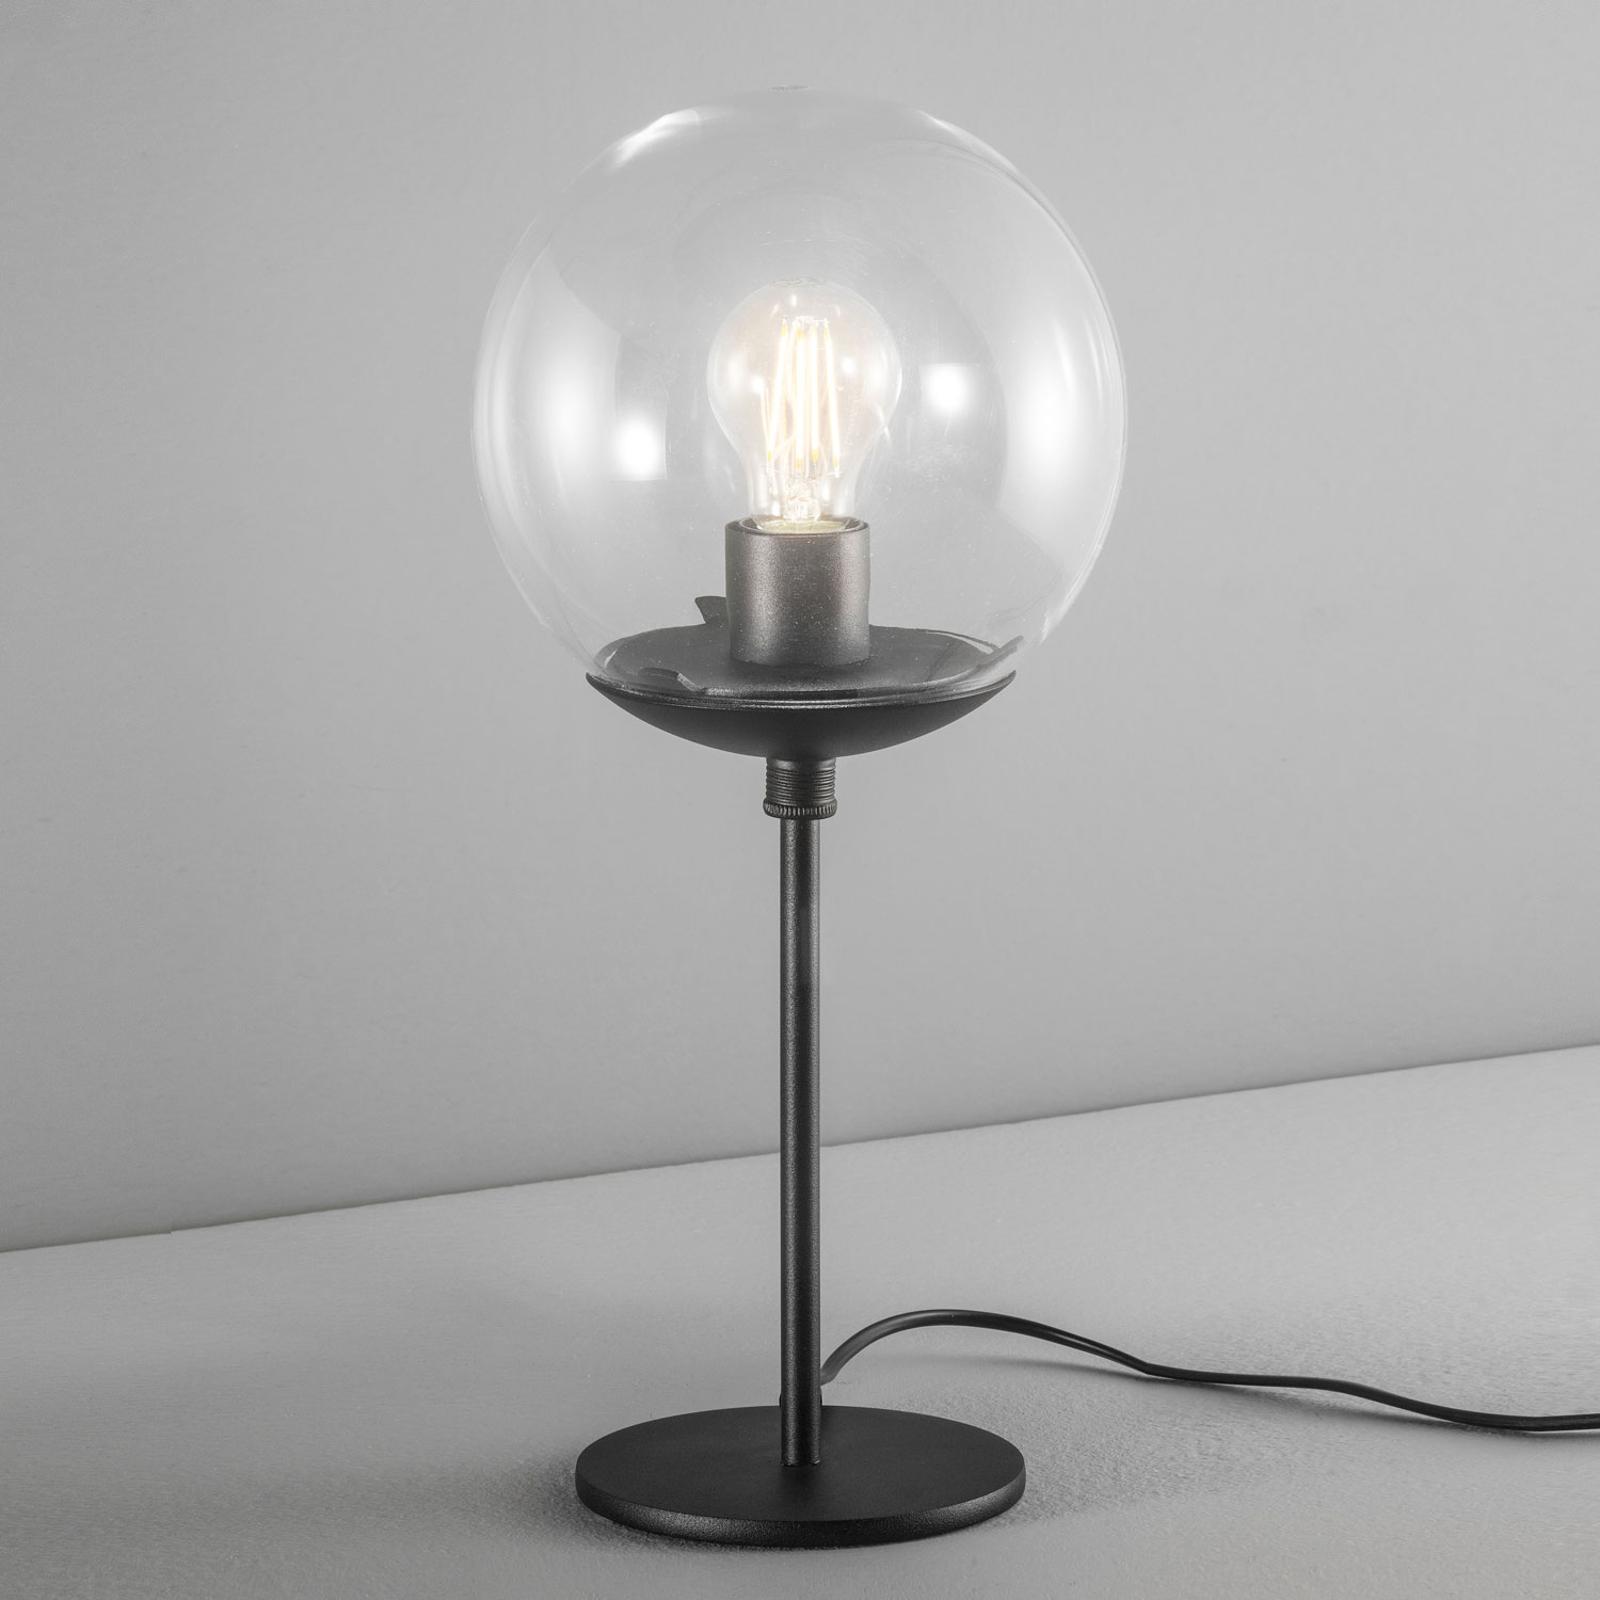 Lampada da tavolo Global Ø 20 cm nero